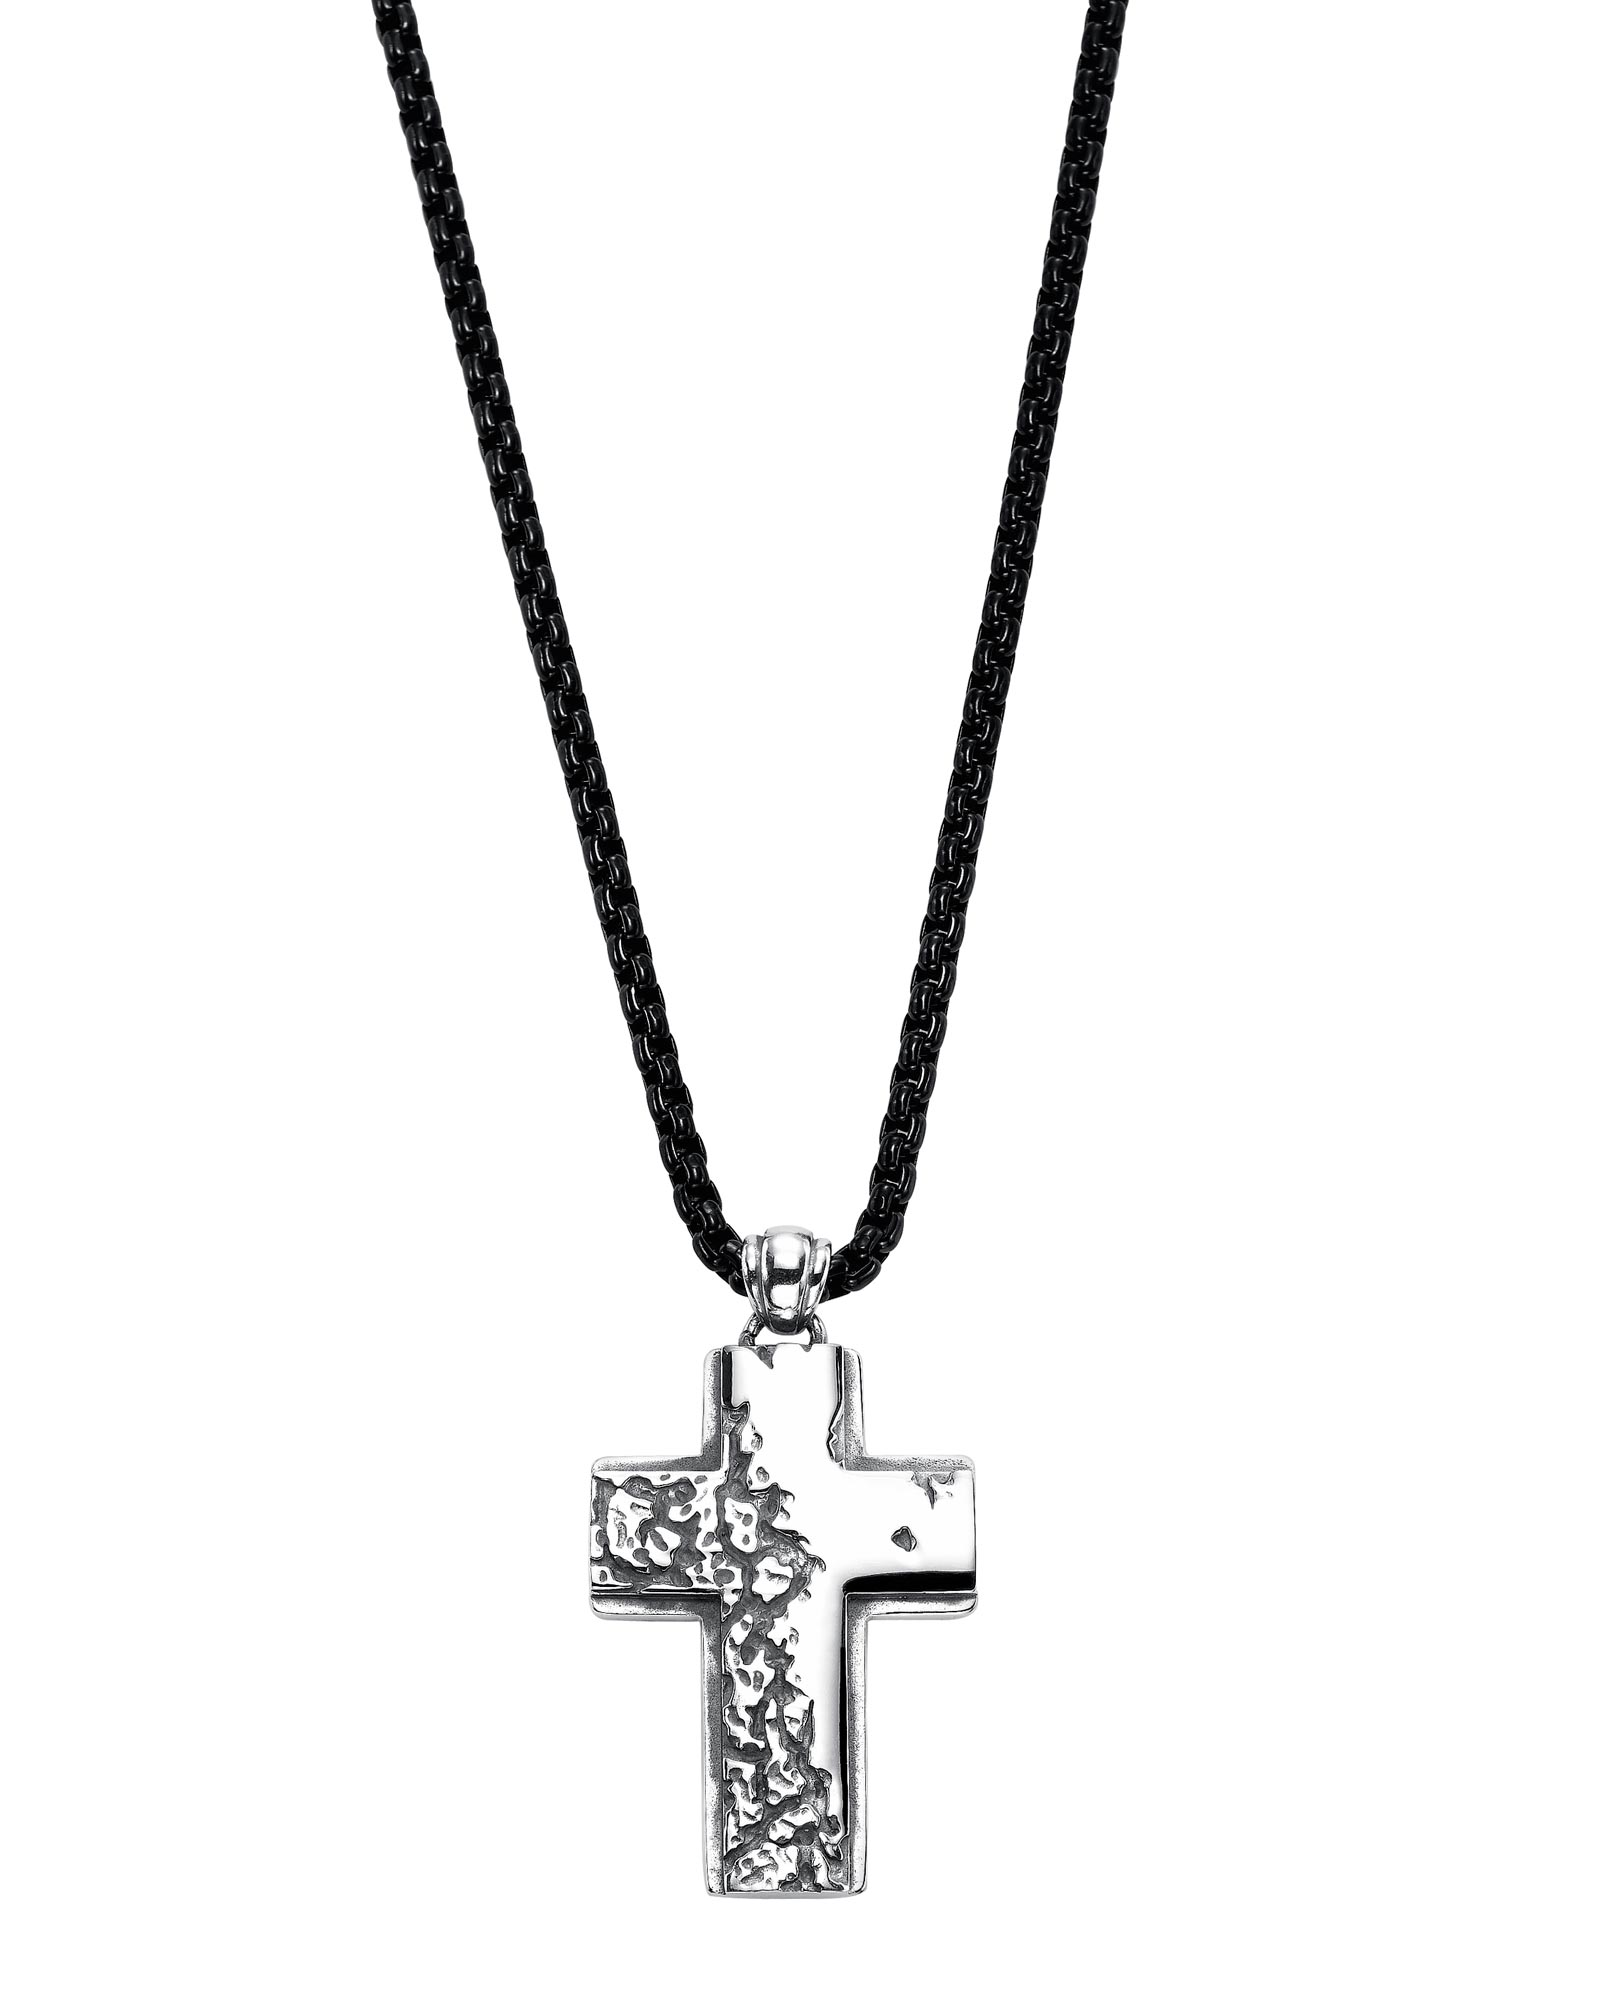 Triton necklace pendants 67 5263 g00 long island ny triton triton necklace pendants 67 5263 g00 aloadofball Images